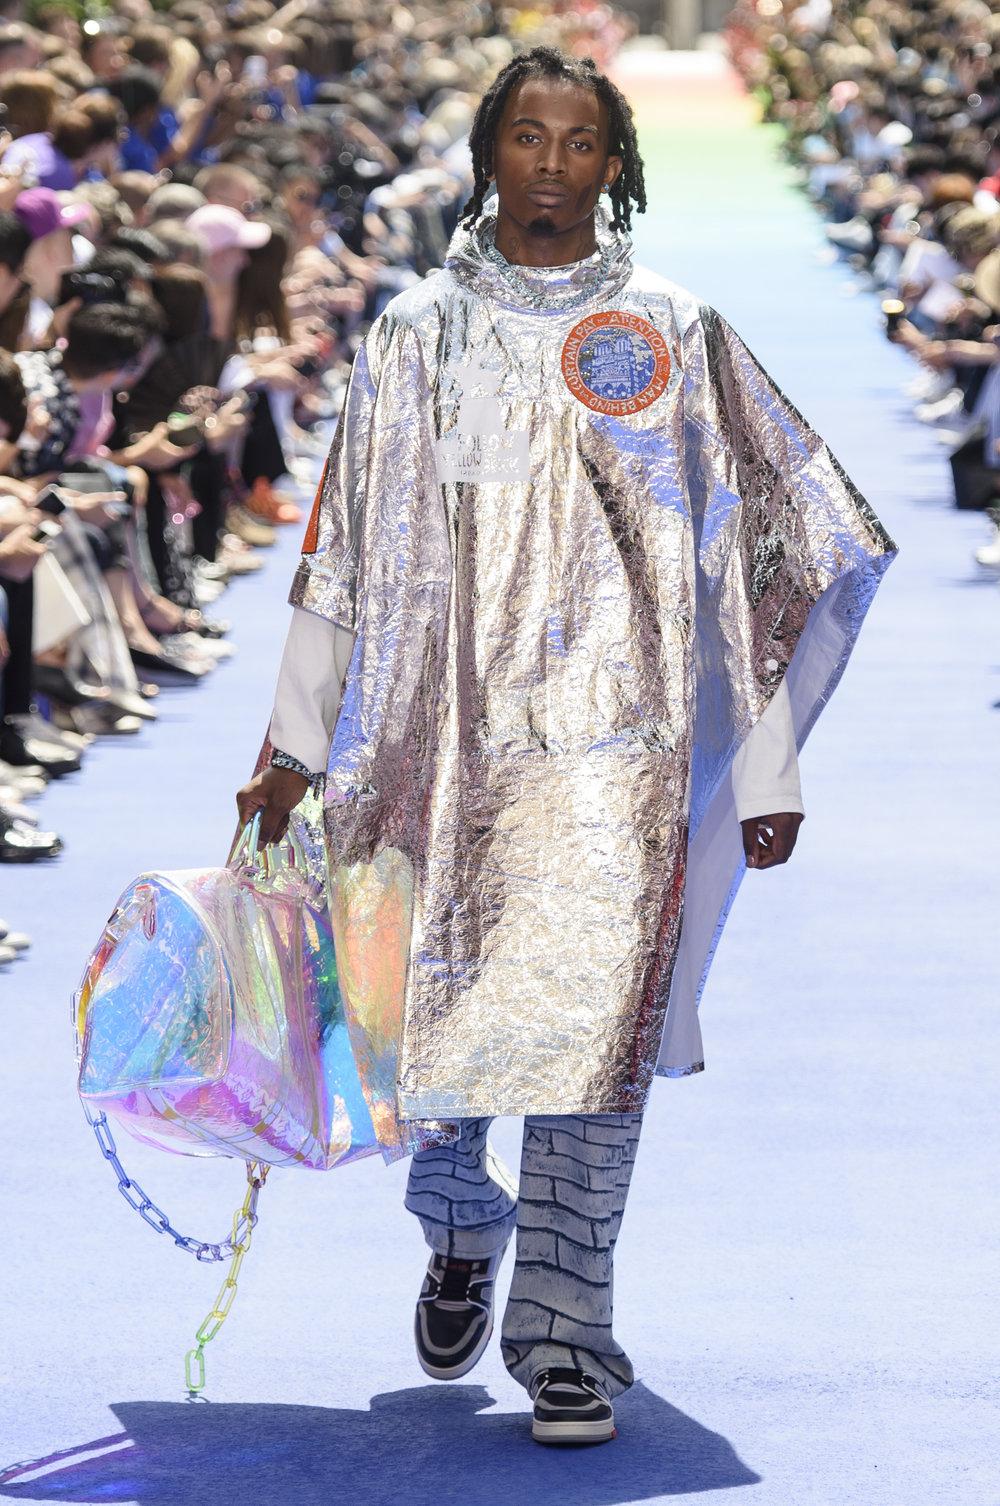 56_Louis_Vuitton_original_vui_prs_ss19_169.jpg